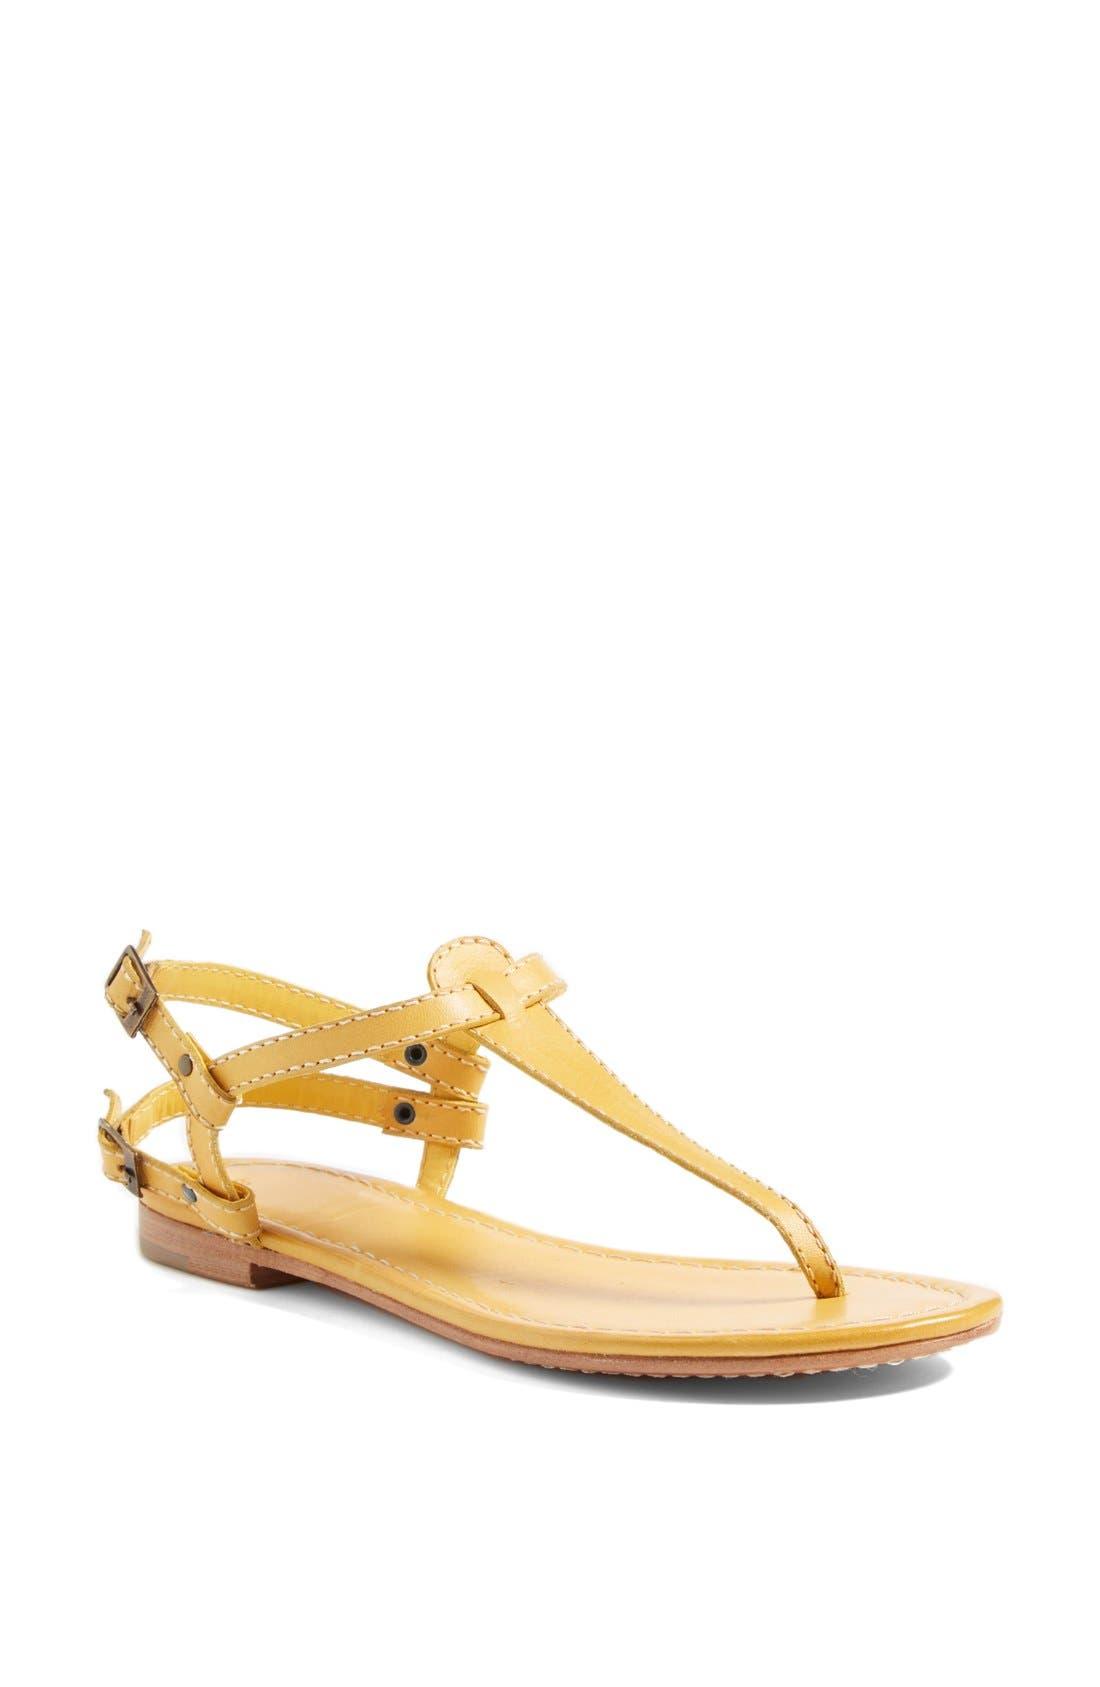 Alternate Image 1 Selected - Hinge 'Sunshine' Flat Sandal